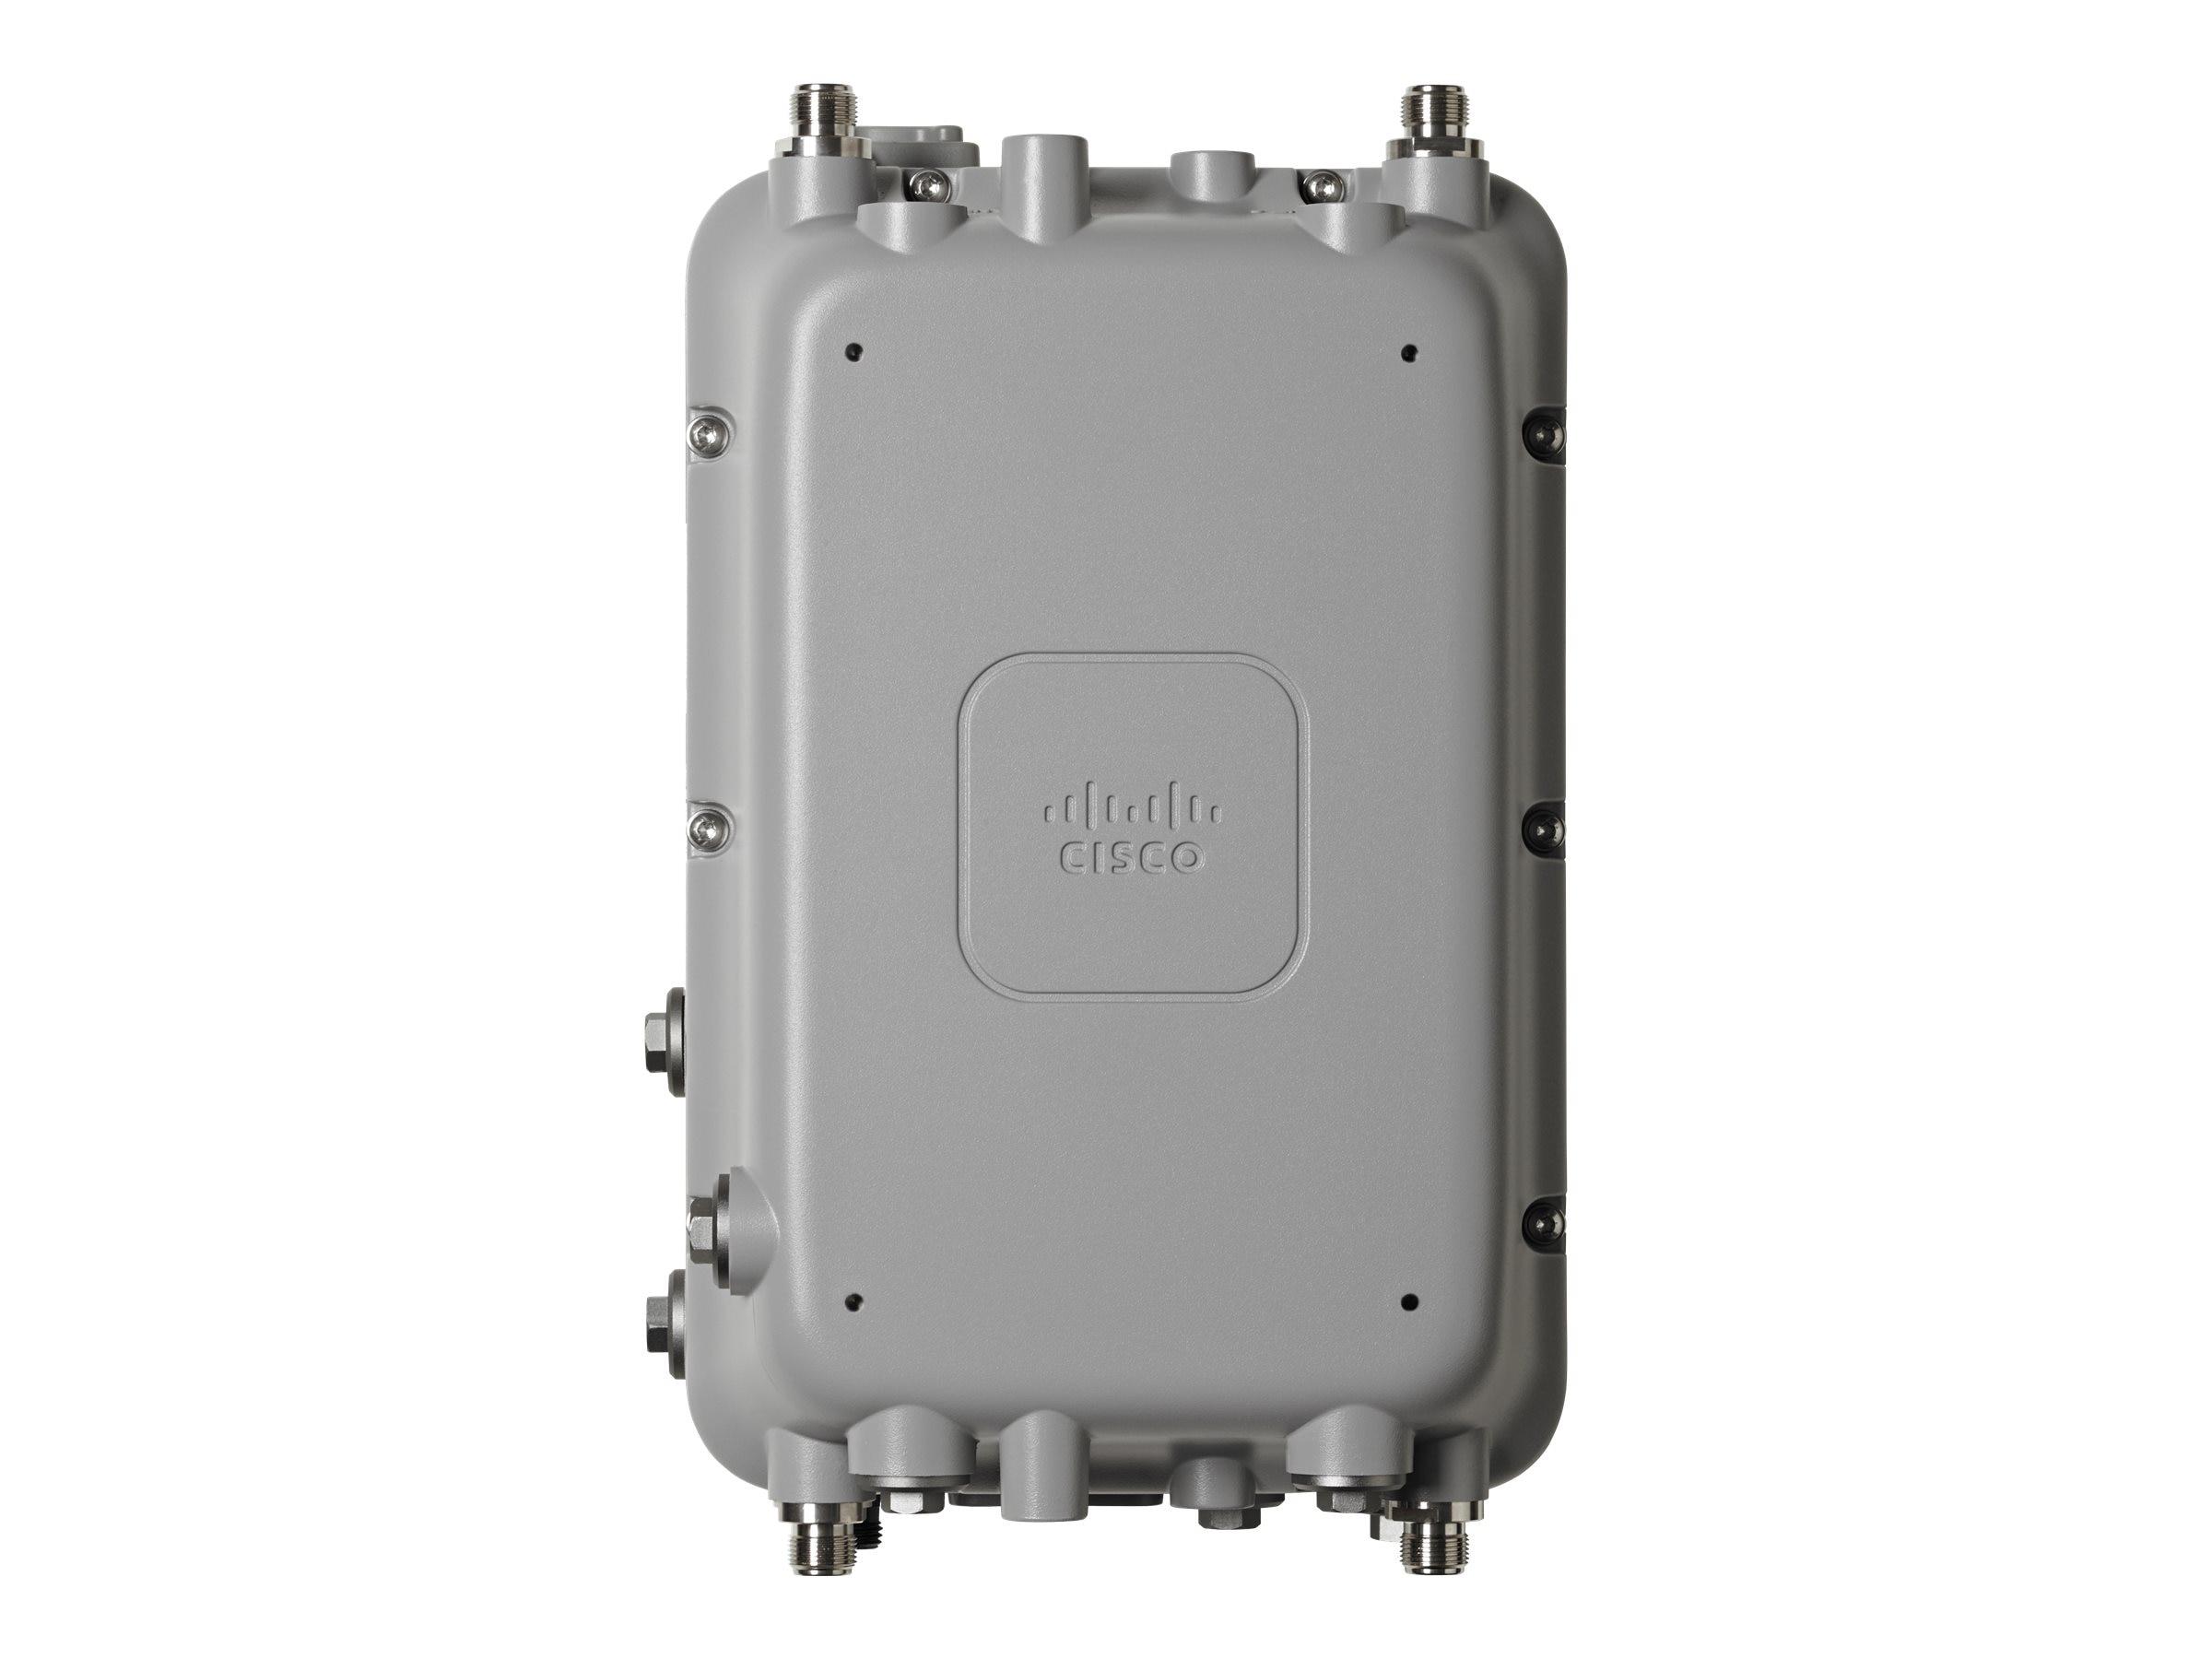 Cisco AIR-AP1572EC1-B-K9 Image 4